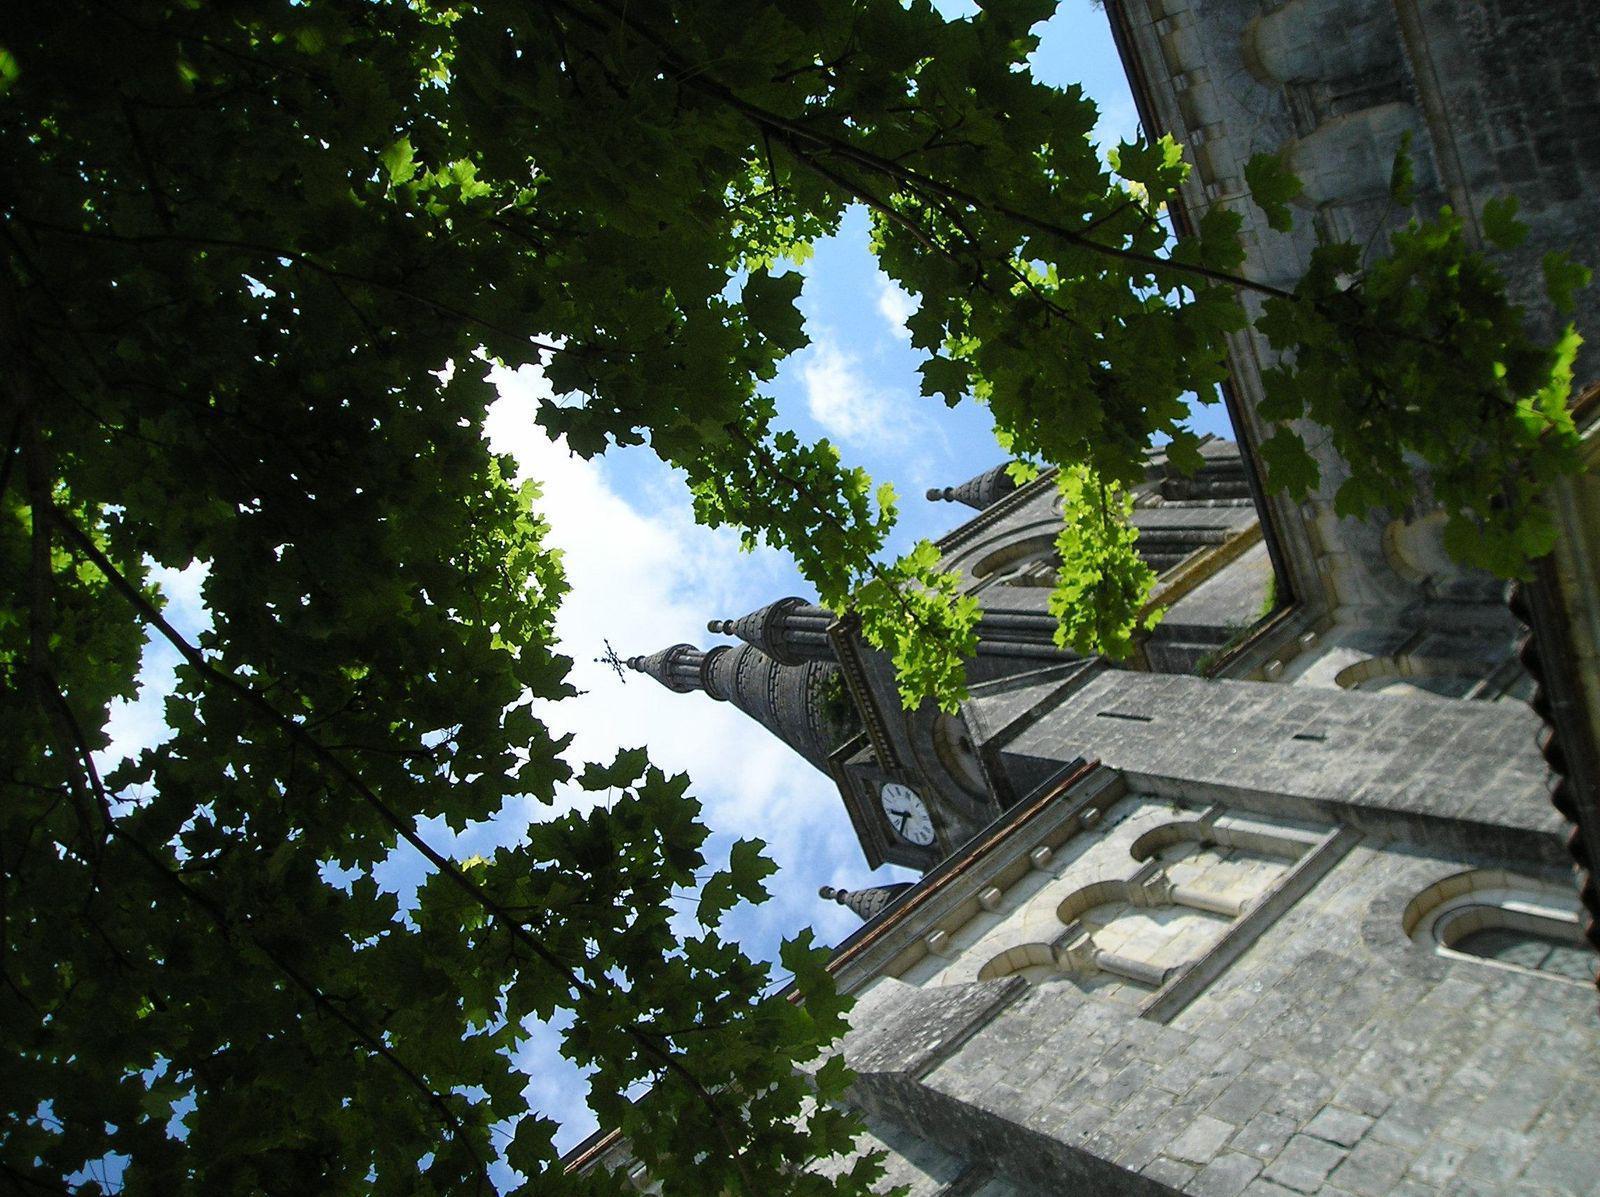 Villebois-Lavalette (1)